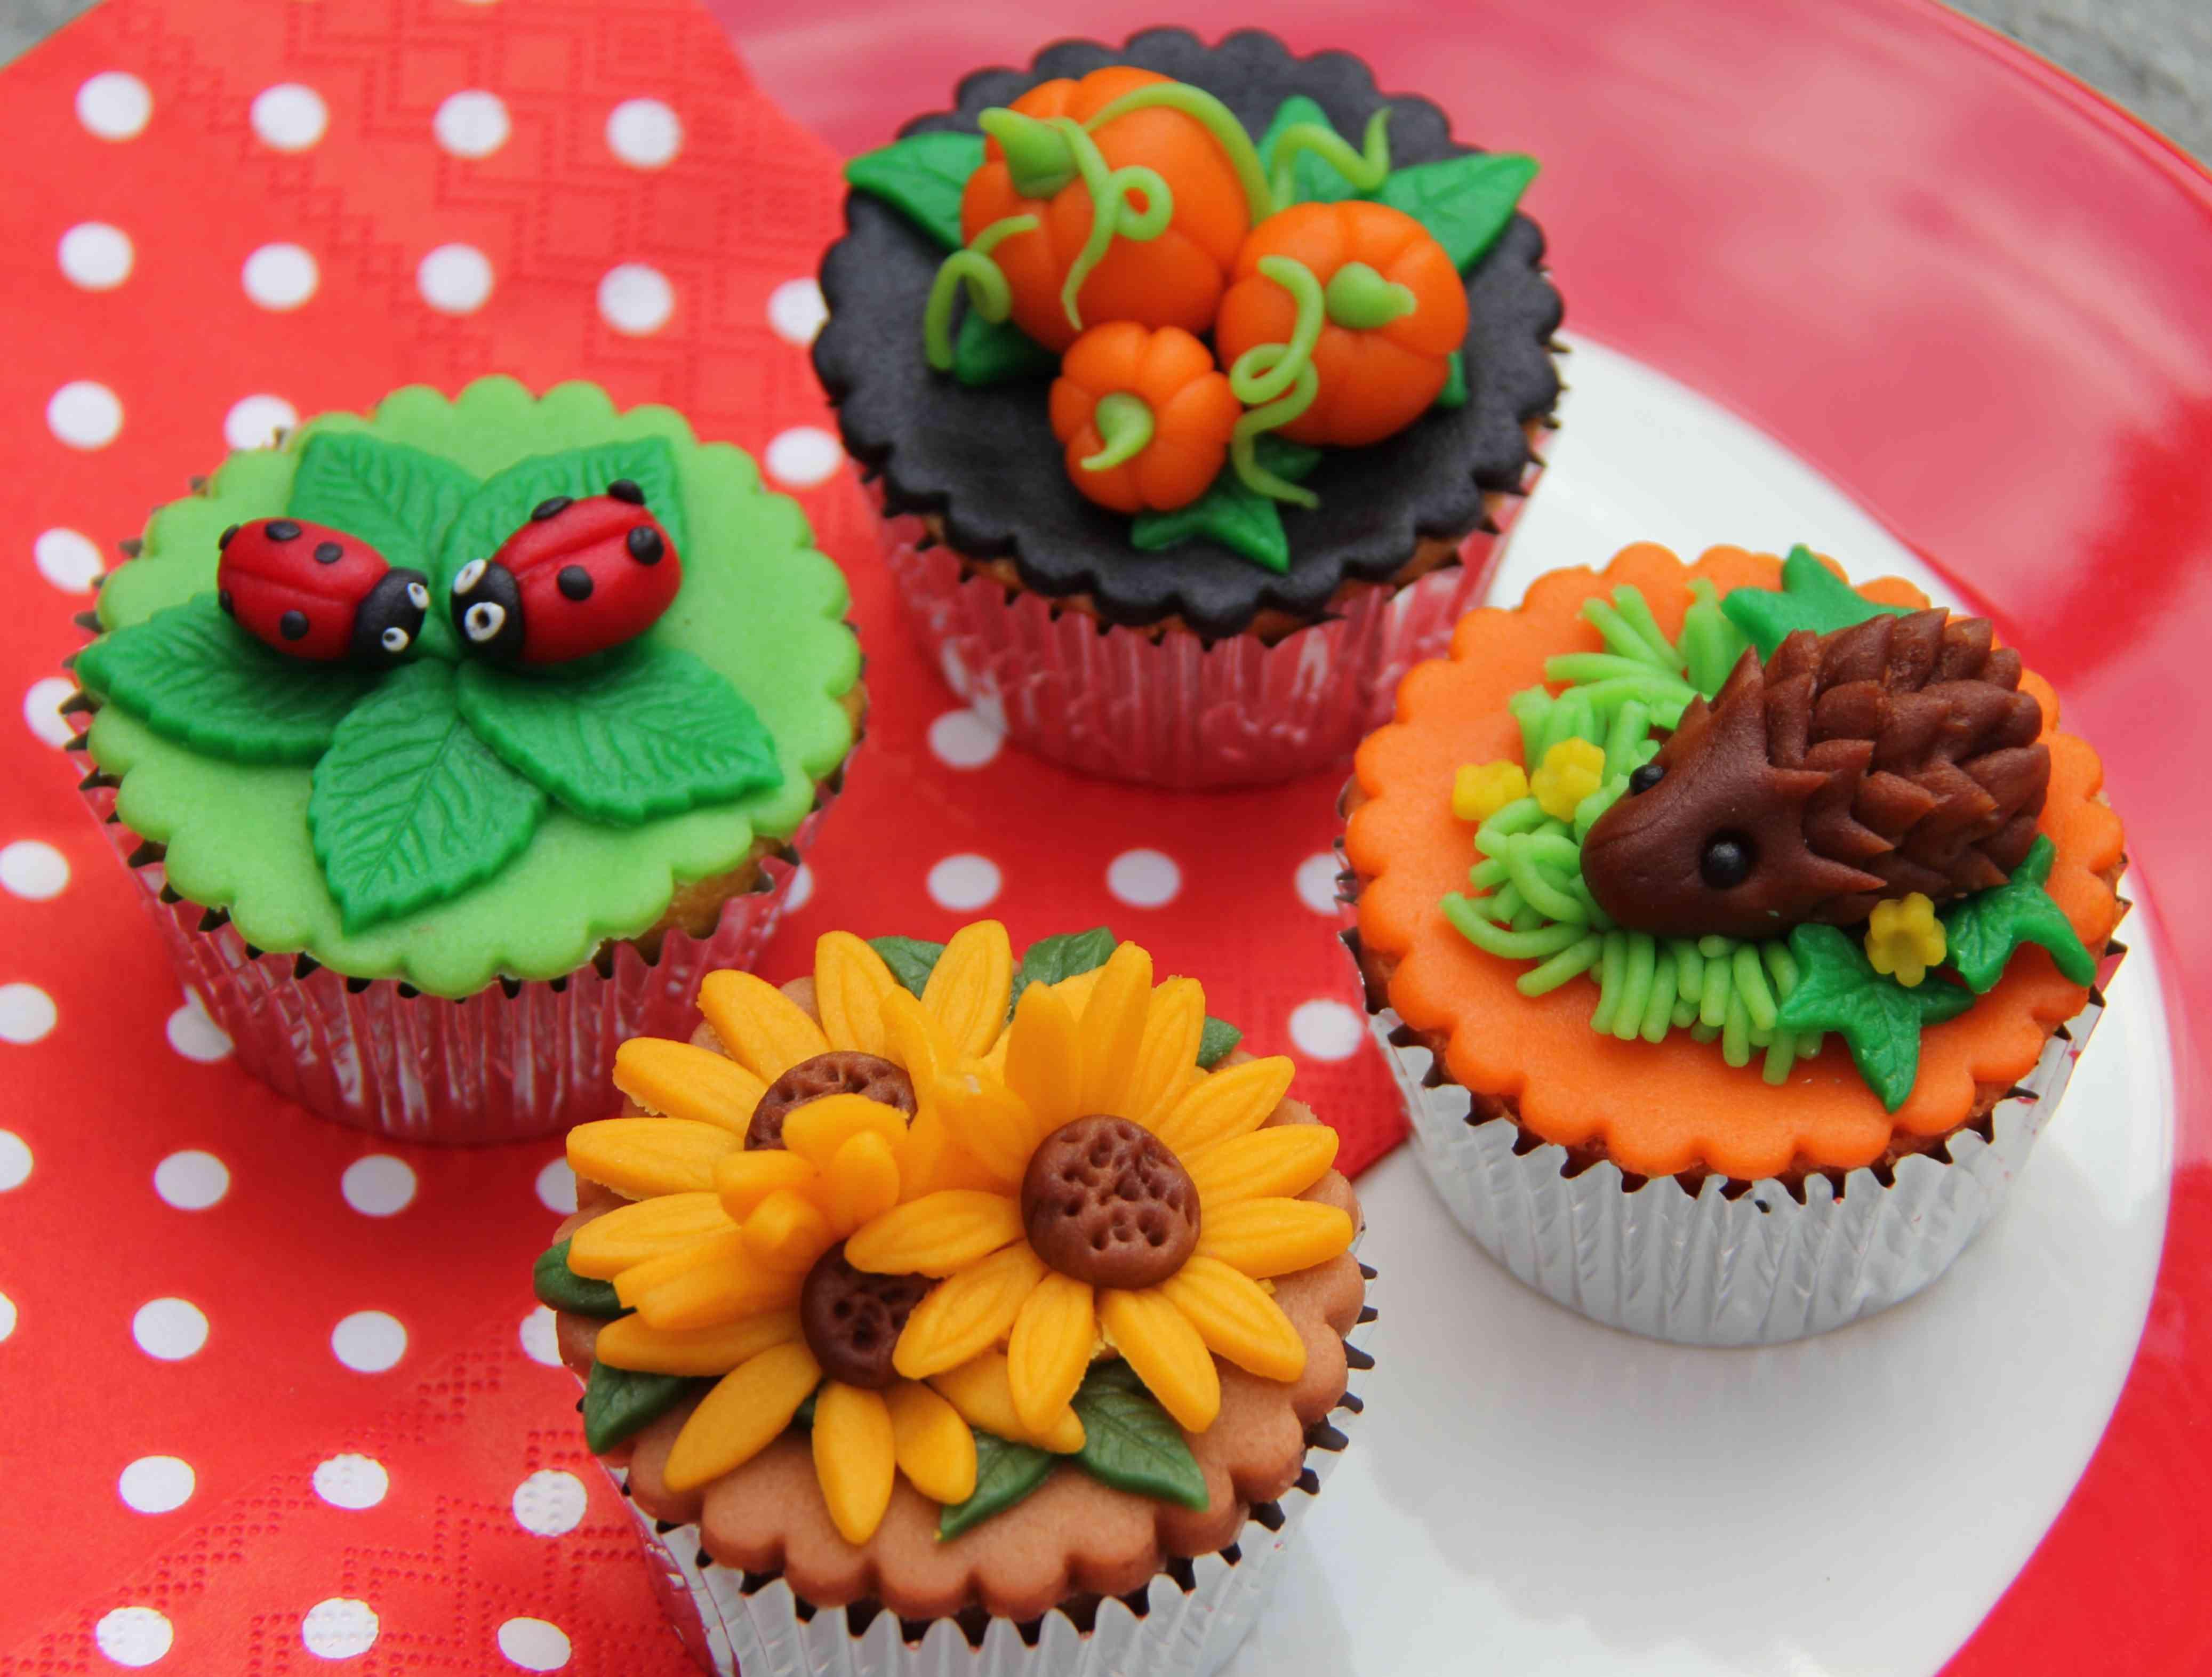 cupcakes versieren met cake ideas and designs. Black Bedroom Furniture Sets. Home Design Ideas